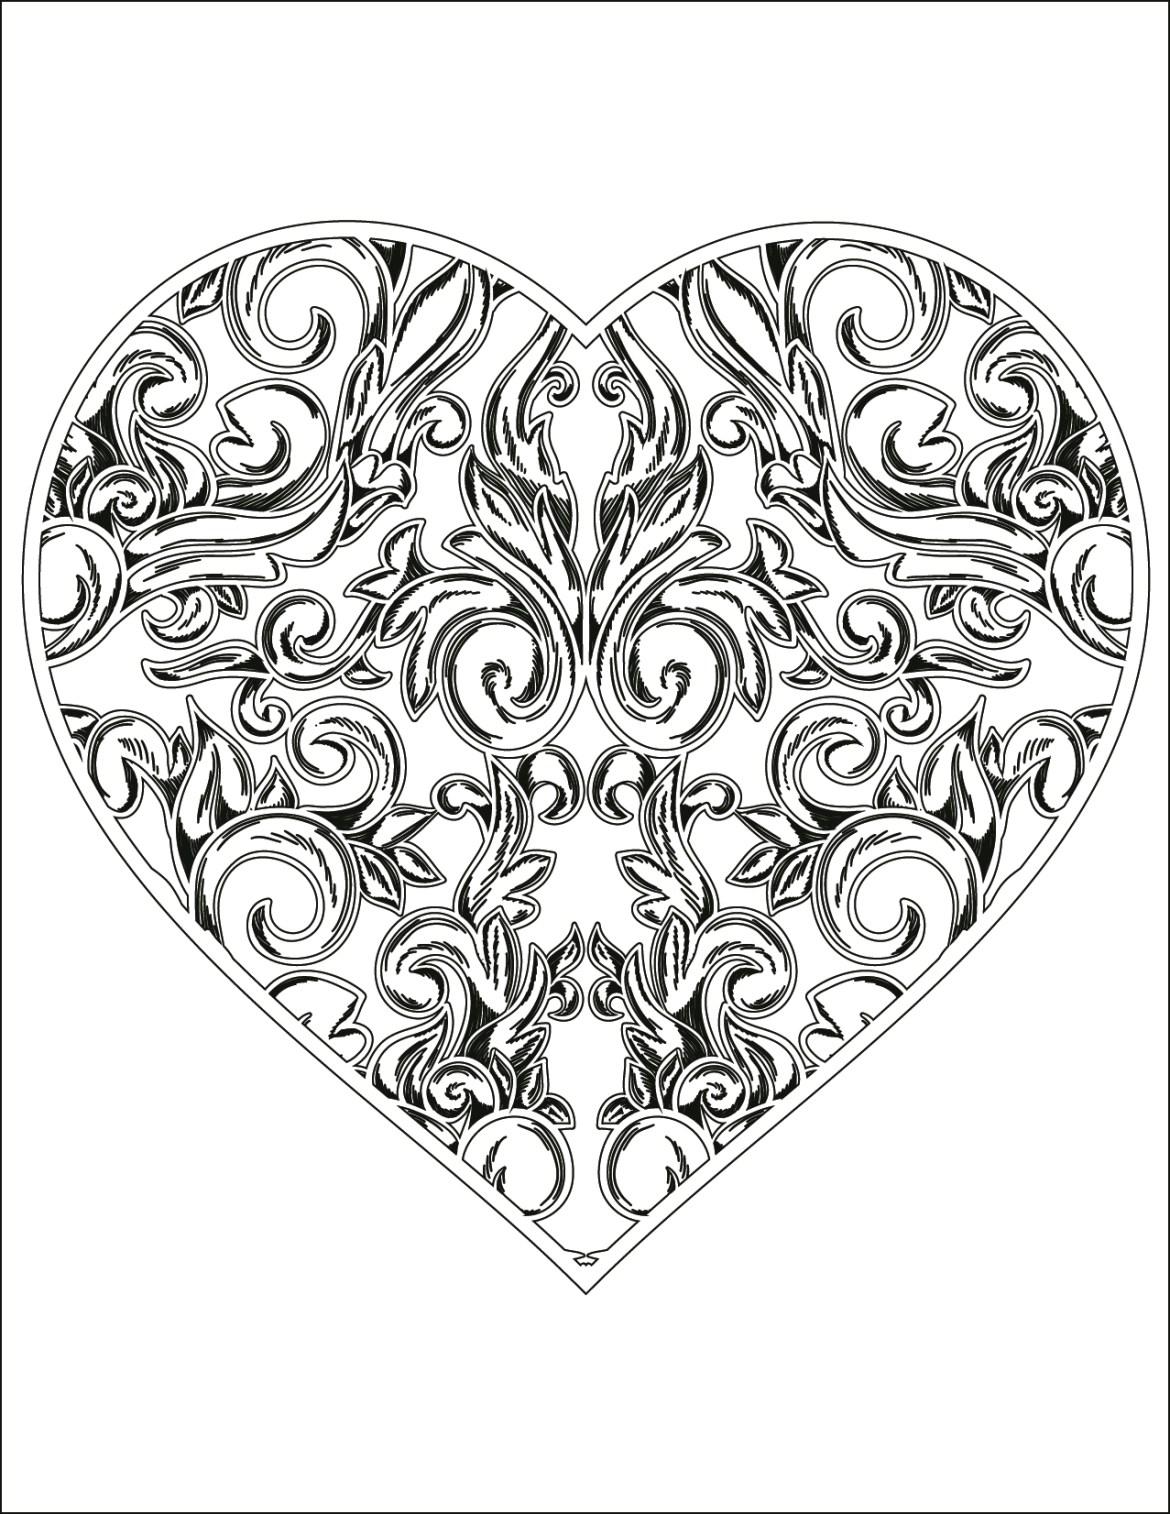 Coloriage Adulte Coeur.Carte St Valentin Coeur A Colorier Pour Adulte Gratuite Artherapie Ca